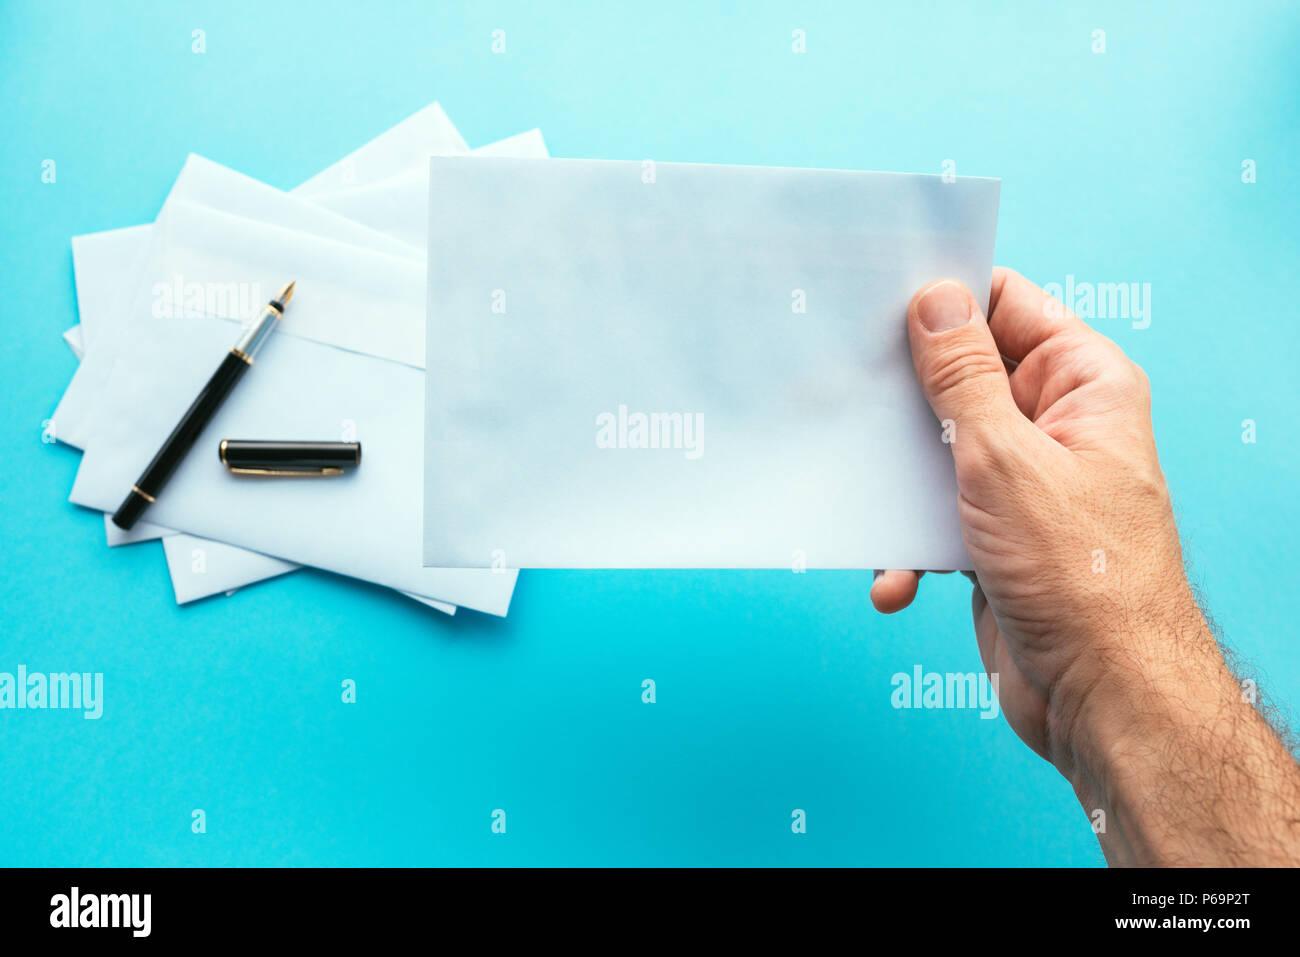 Hand holding blank white envelope, mock up image for communication and correspondence themes - Stock Image